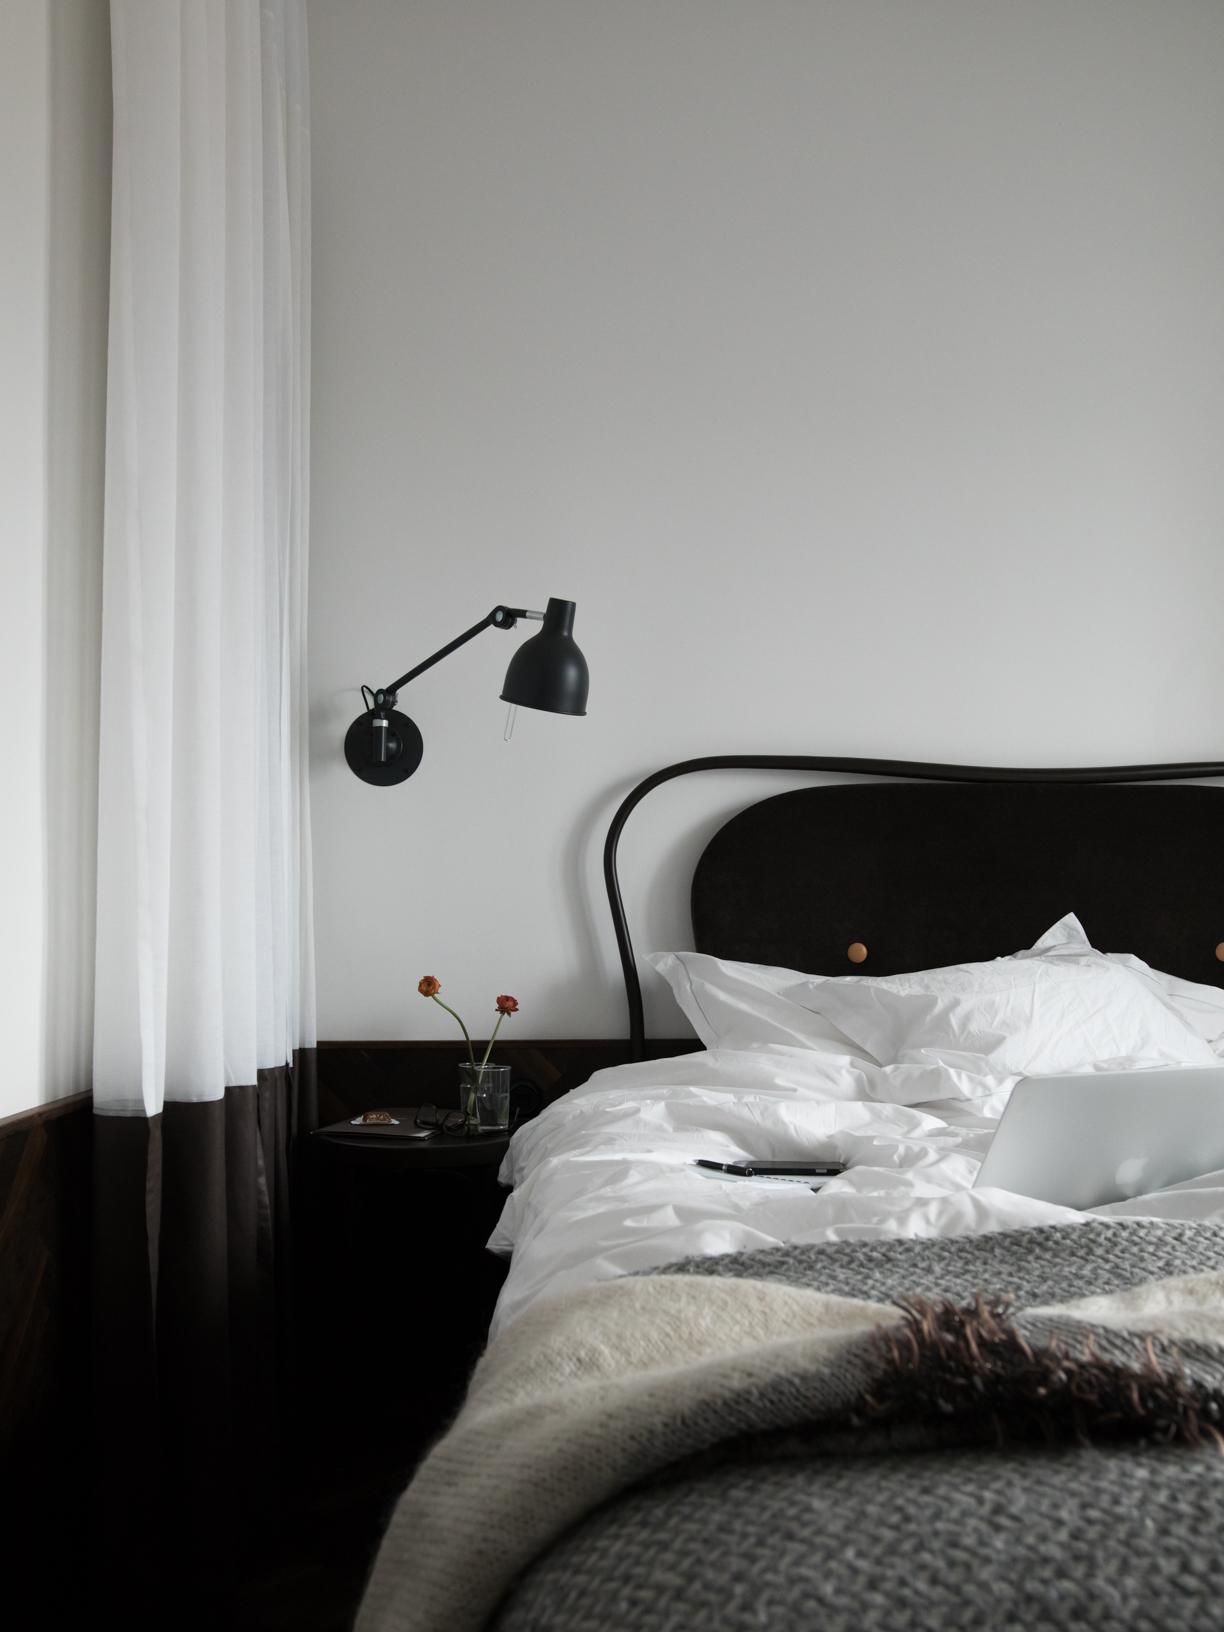 1_Miss-Clara-hotell_Daniella-Witte.jpg